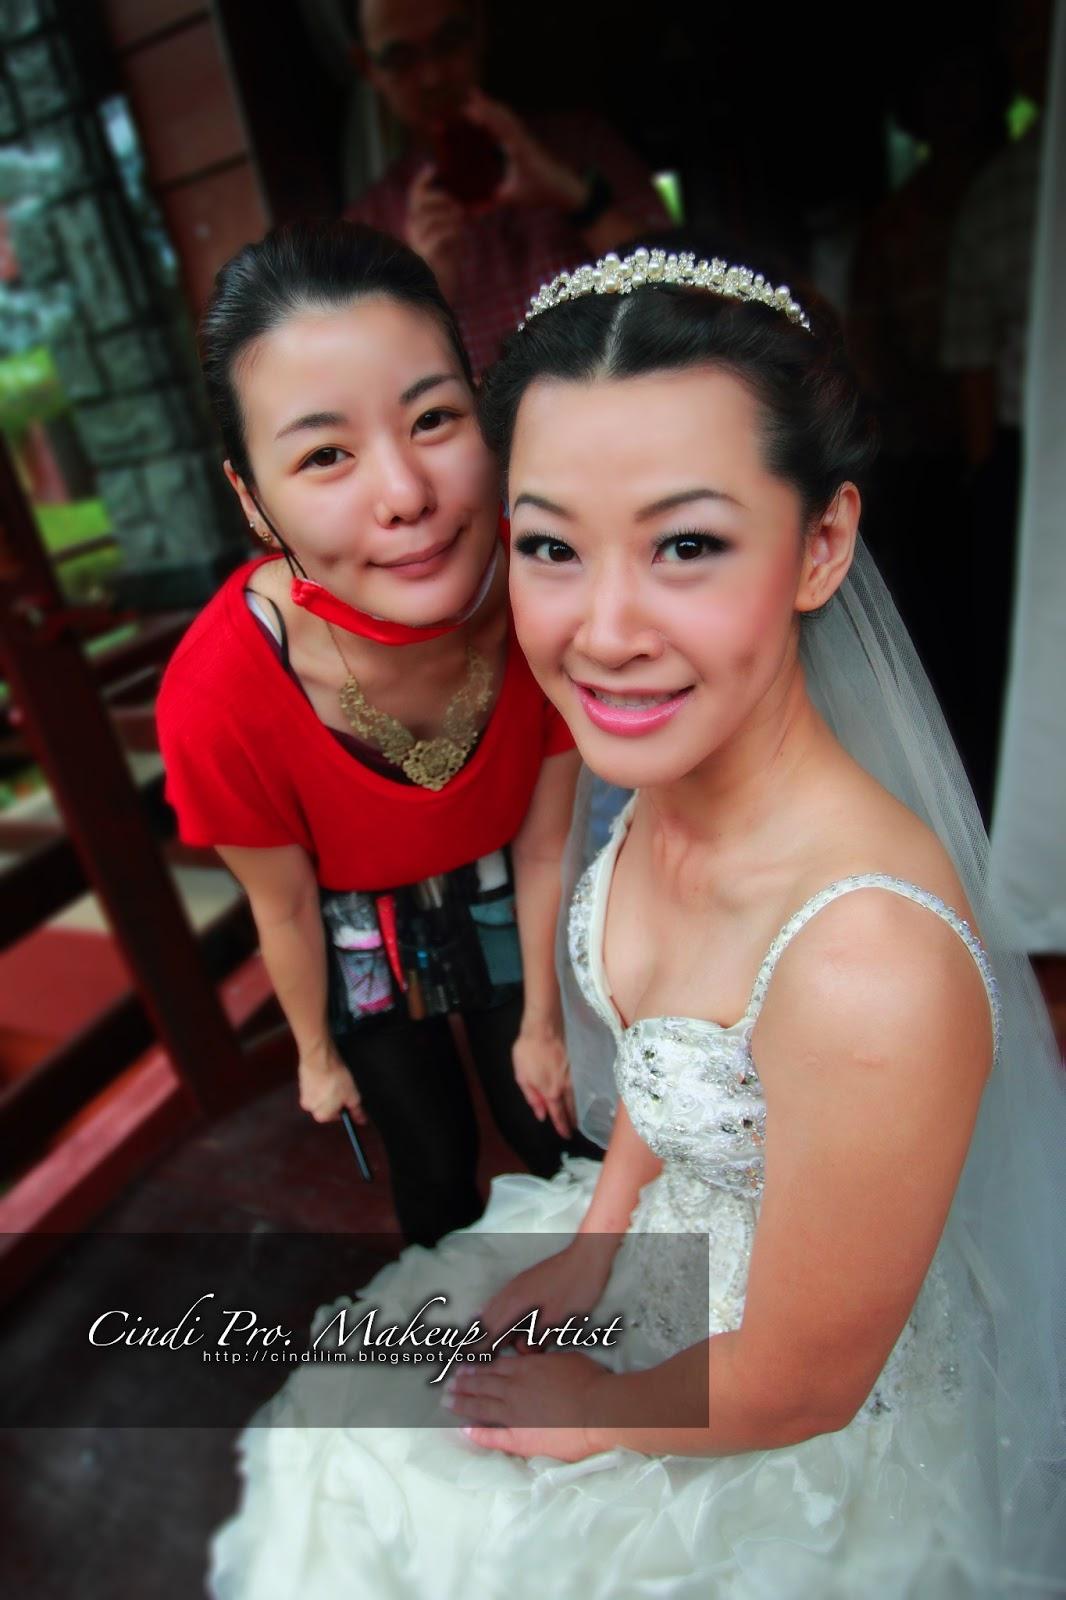 Cindi Pro Makeup Artist Commercial Photoshoot Makeup: :: Cindi Pro. Makeup Artist ::: AD Of Carol Ong